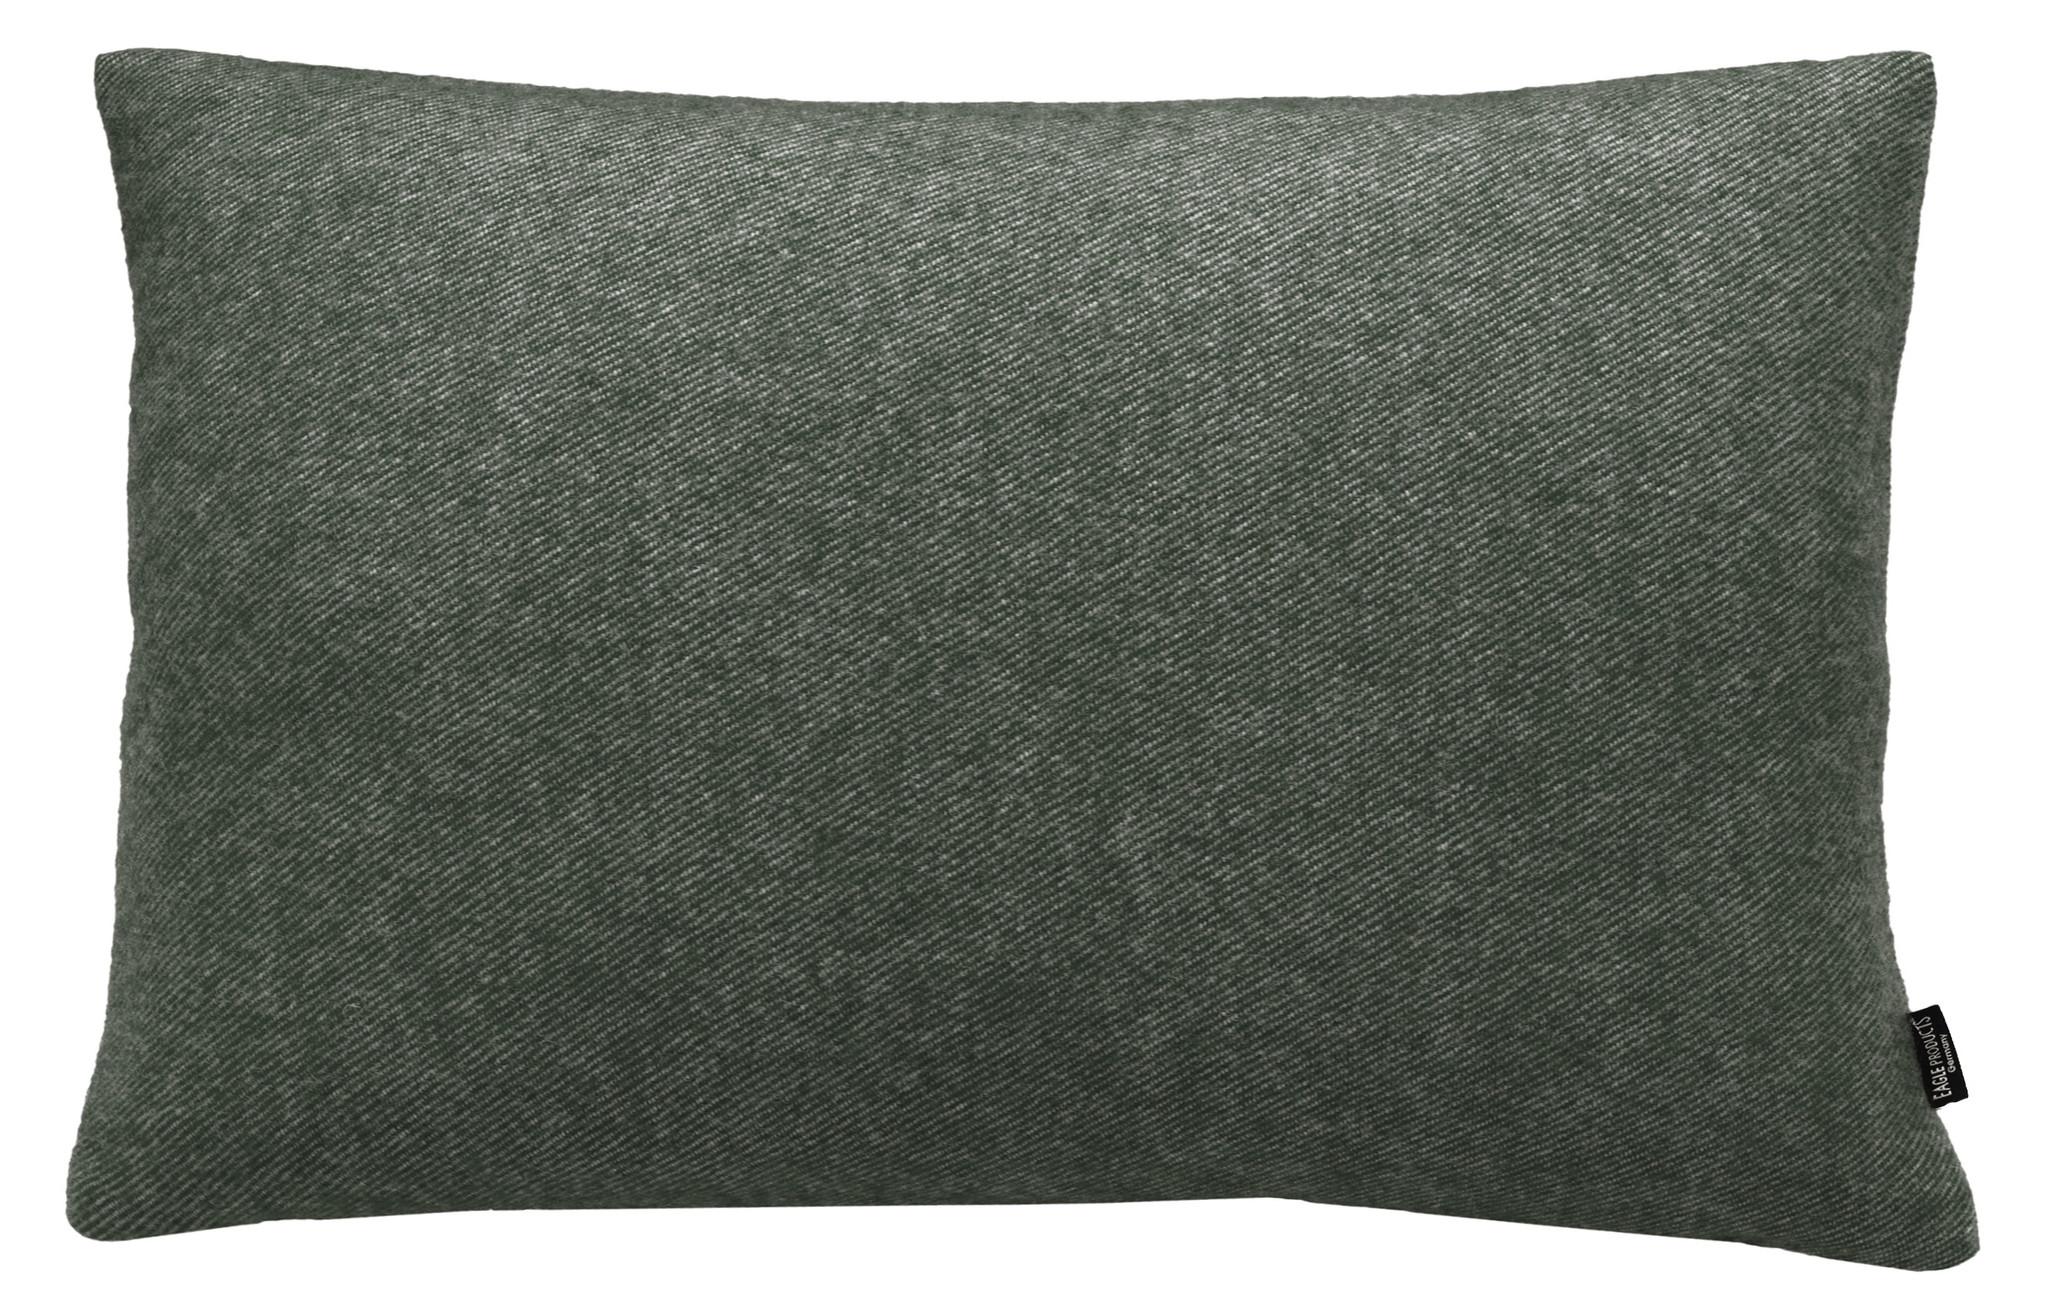 Eagle Produkts  Kissenbezüge 40x60 cm  (2 Stück pro Farbe im Set) Boston Lammwolle-40x60 cm